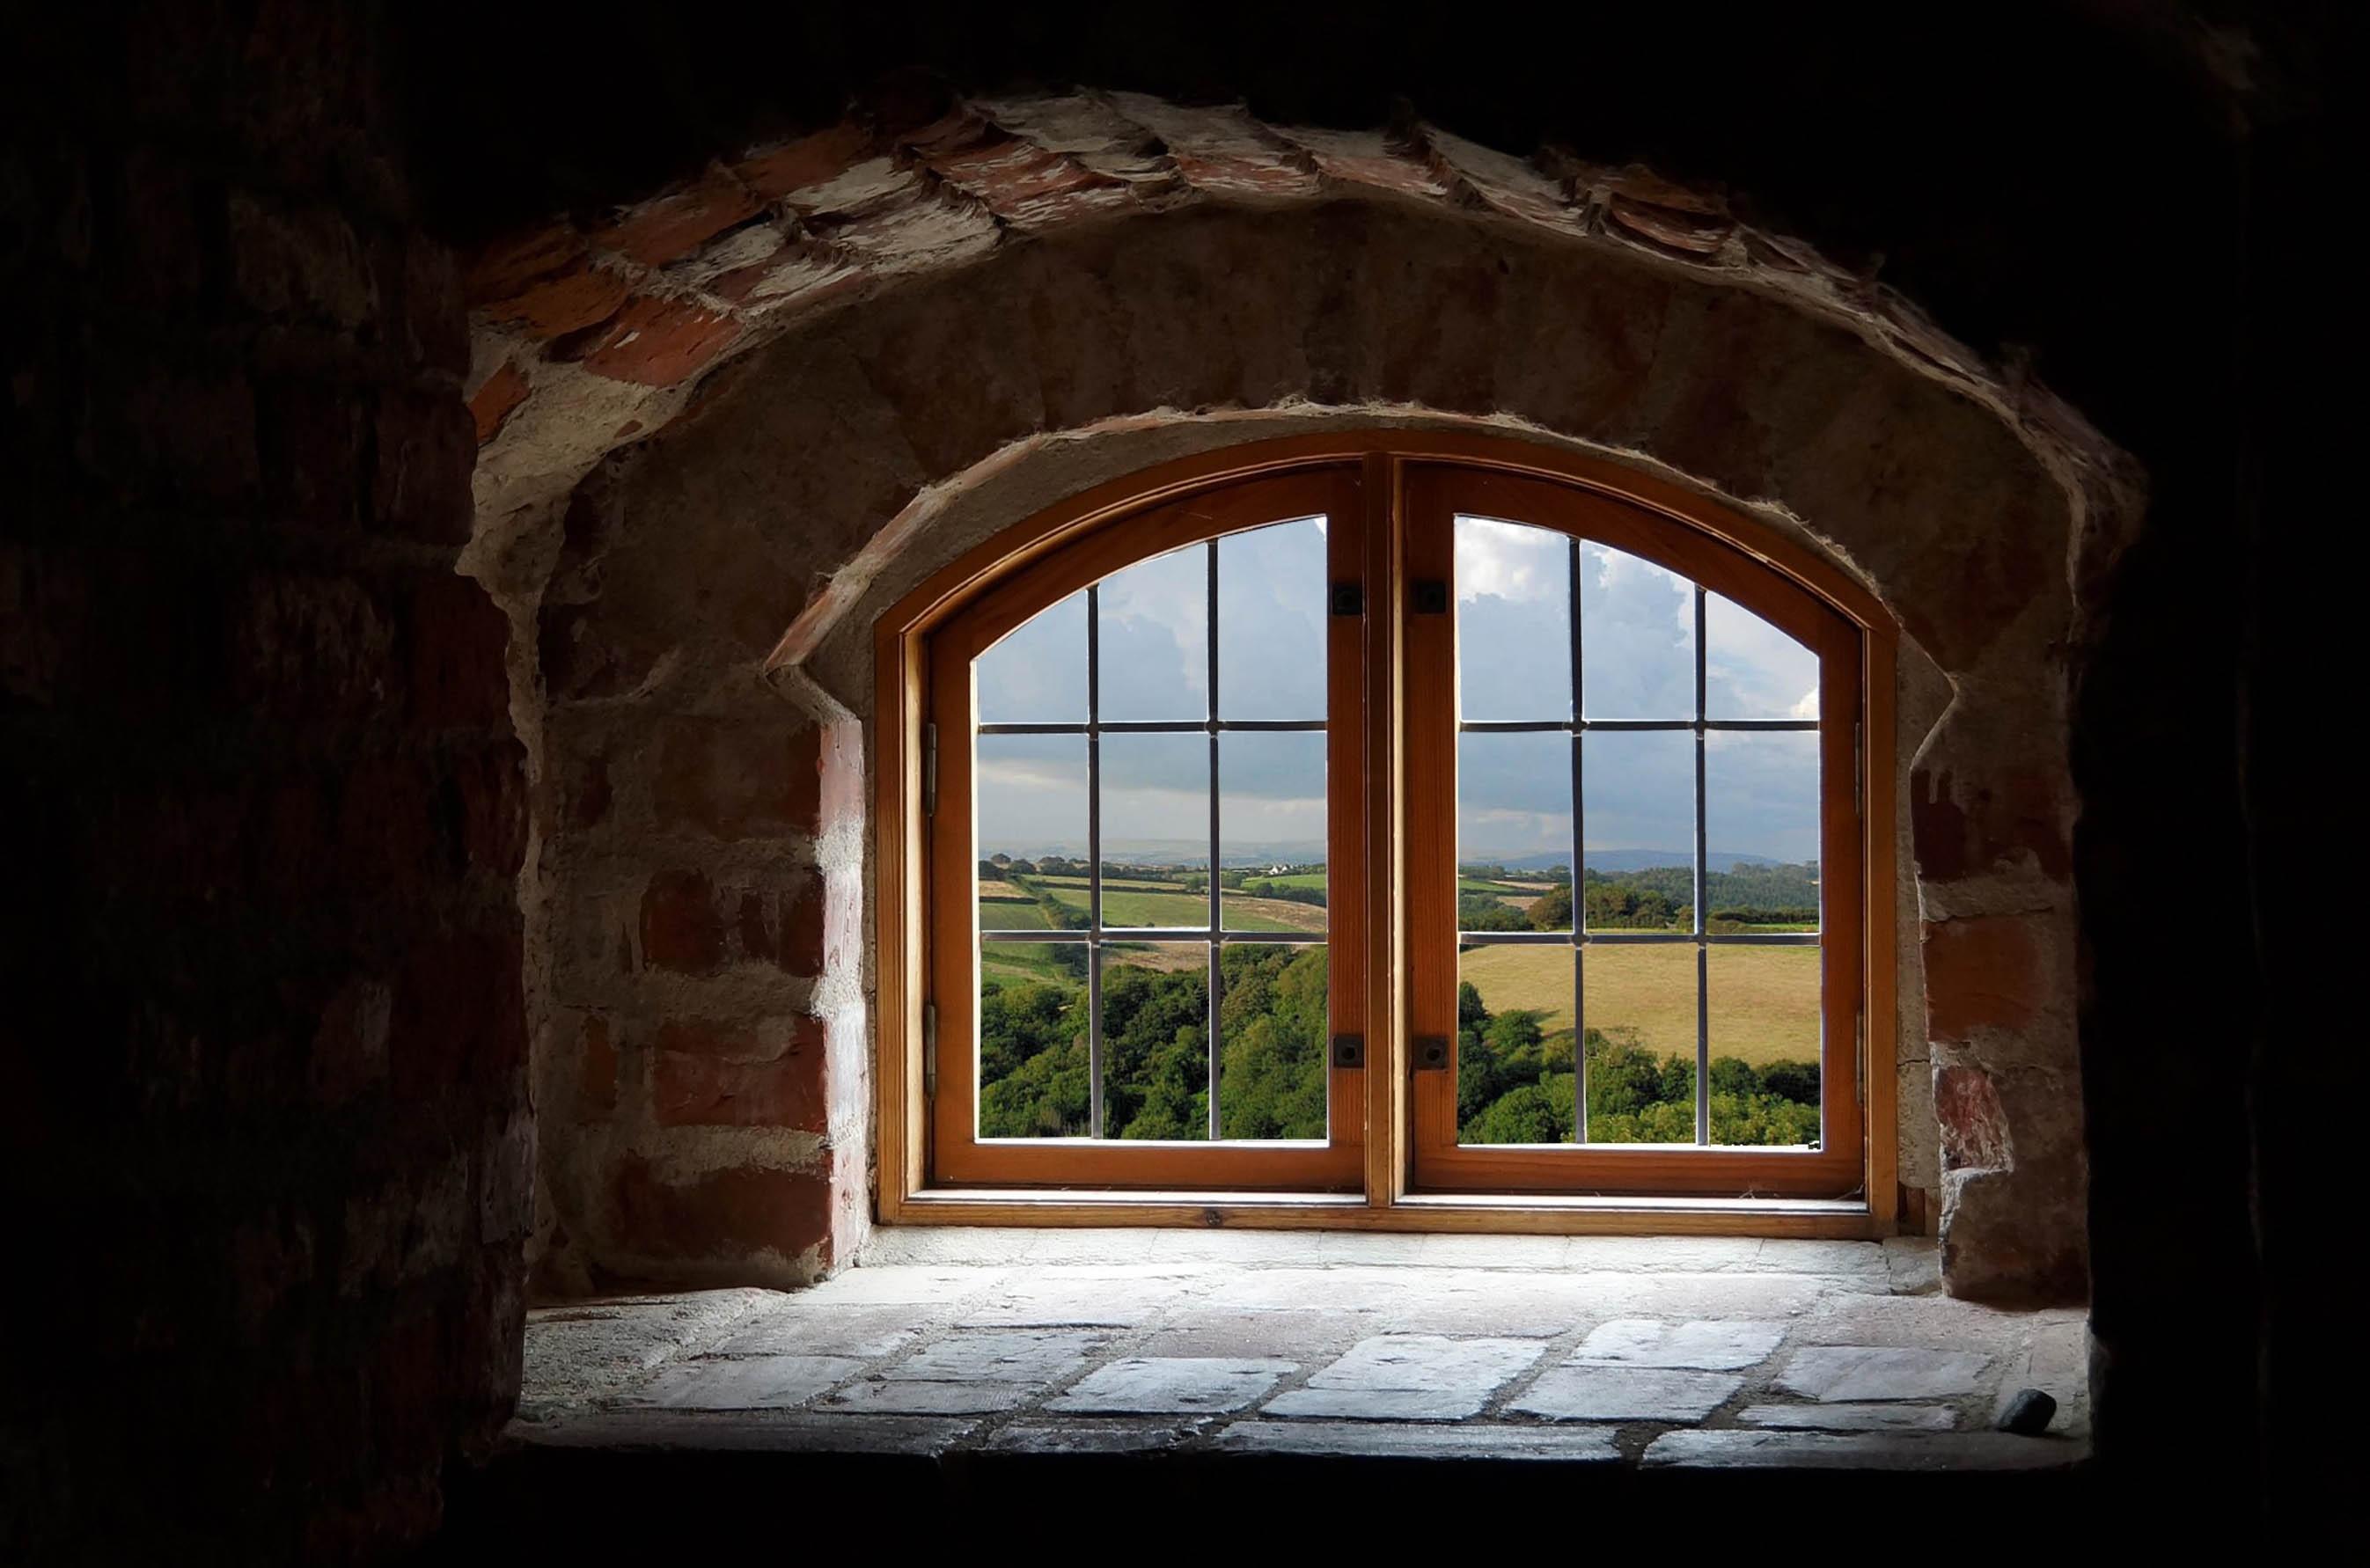 window-1876839